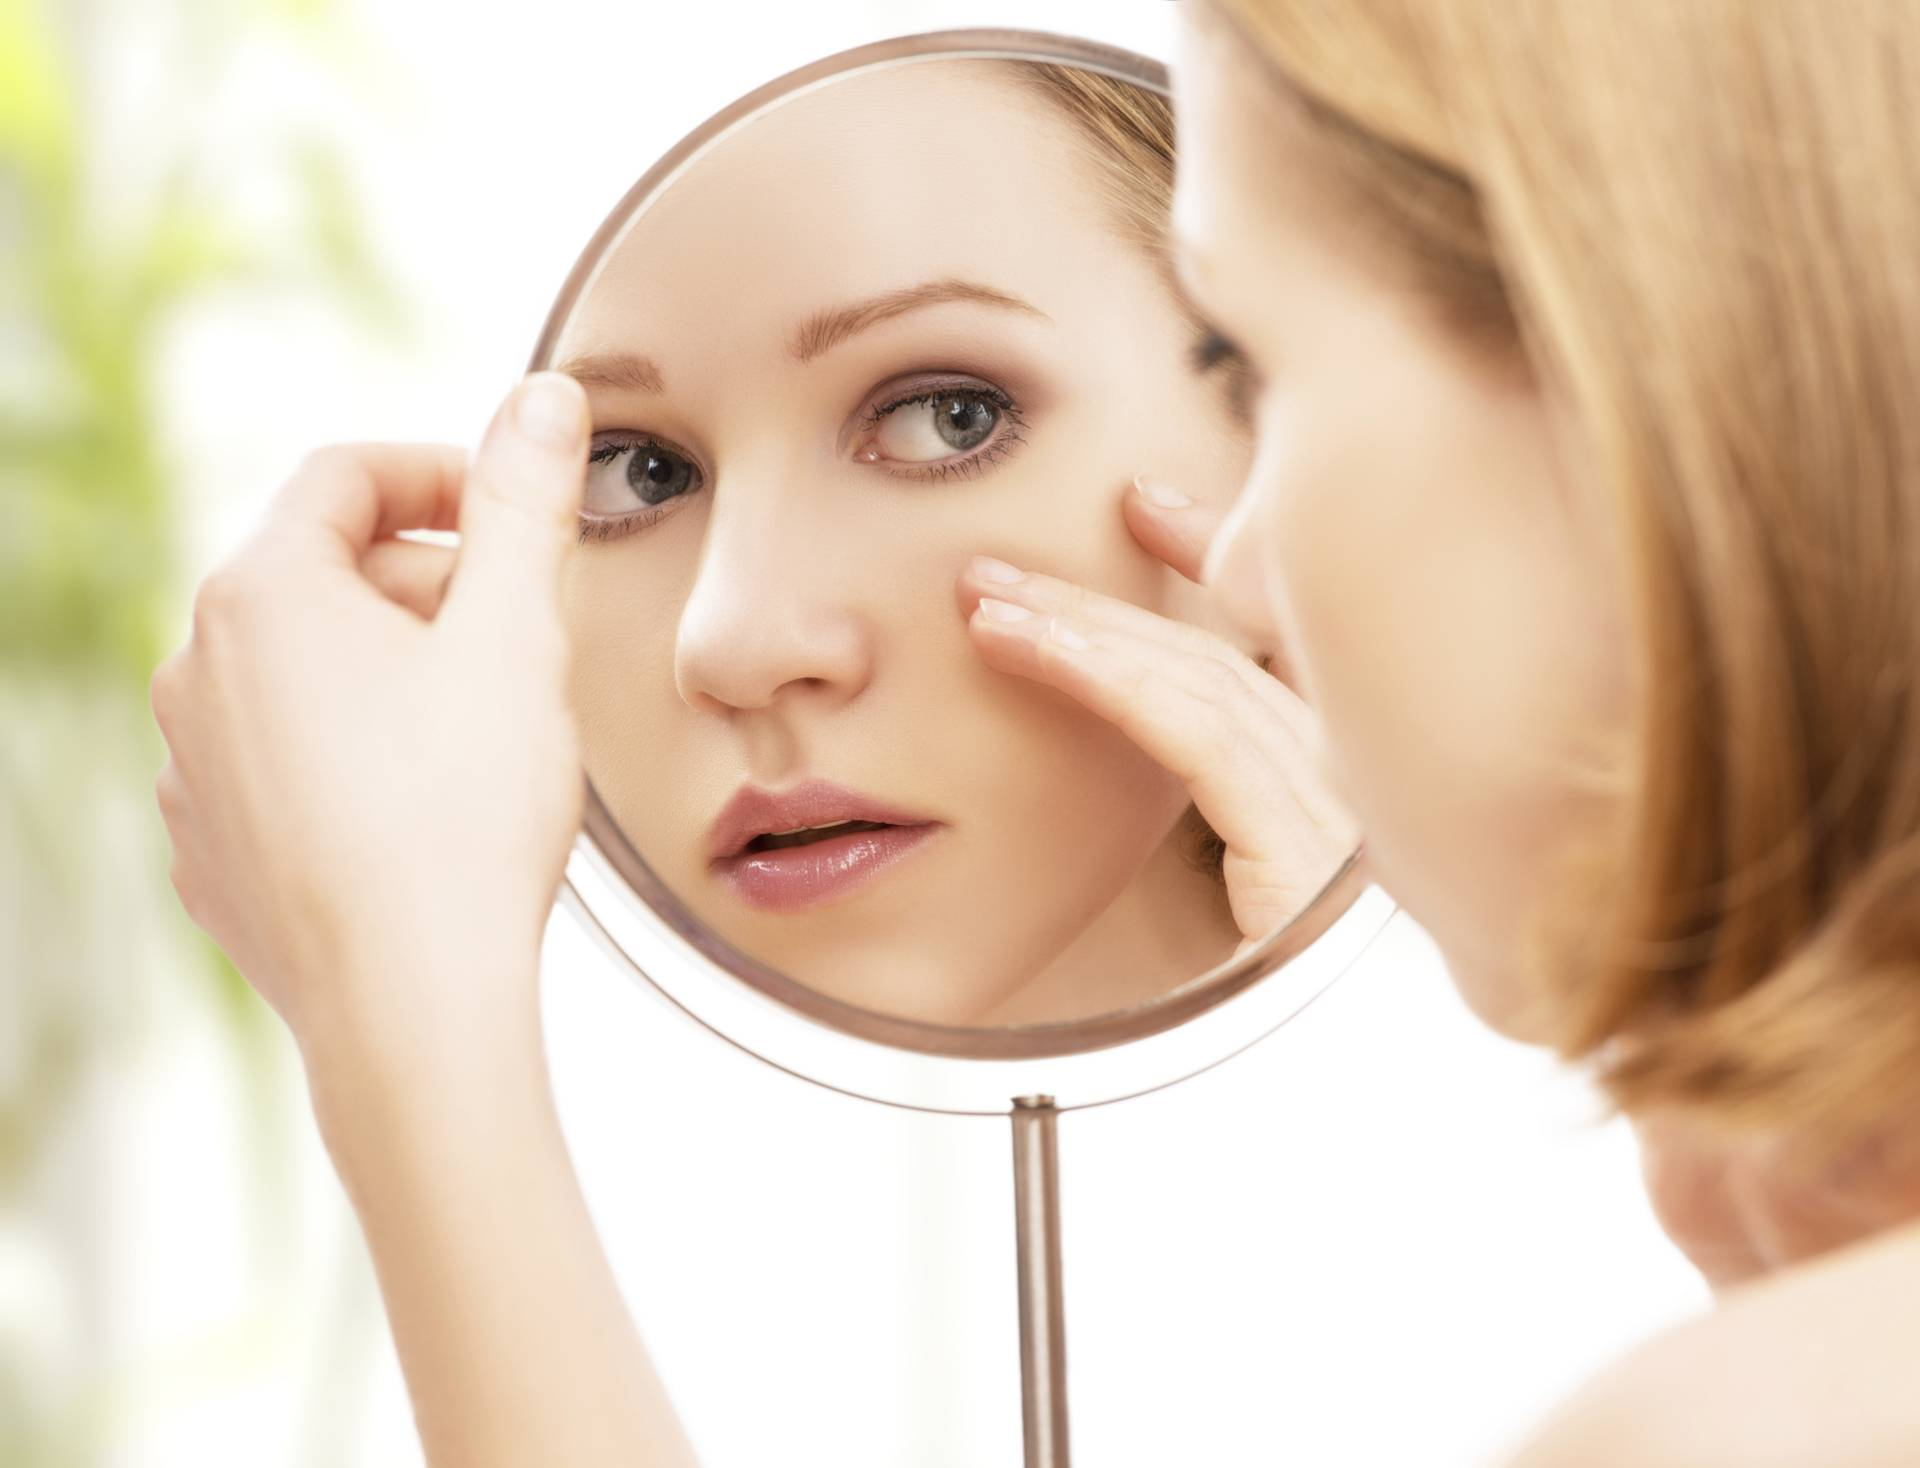 Otkrivamo kako prepoznati tip kože lica i pravilno je njegovati